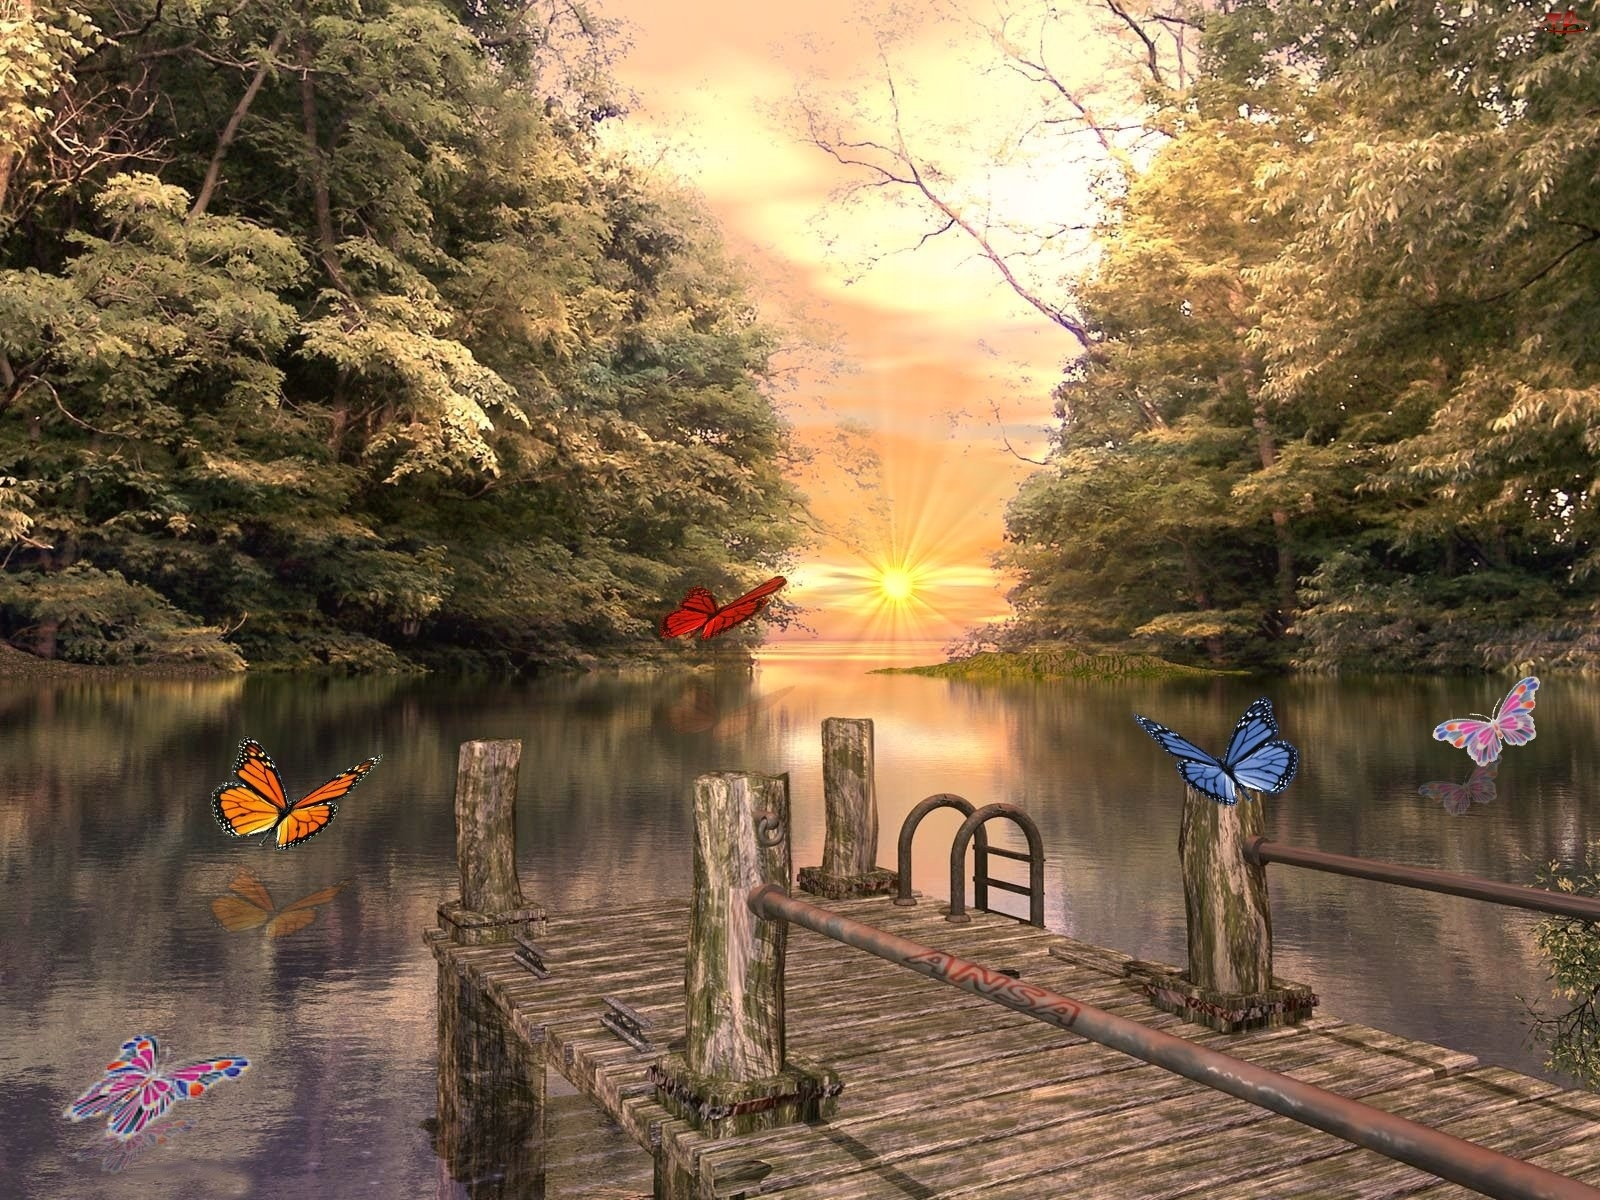 Pomost, Jezioro, Motyl